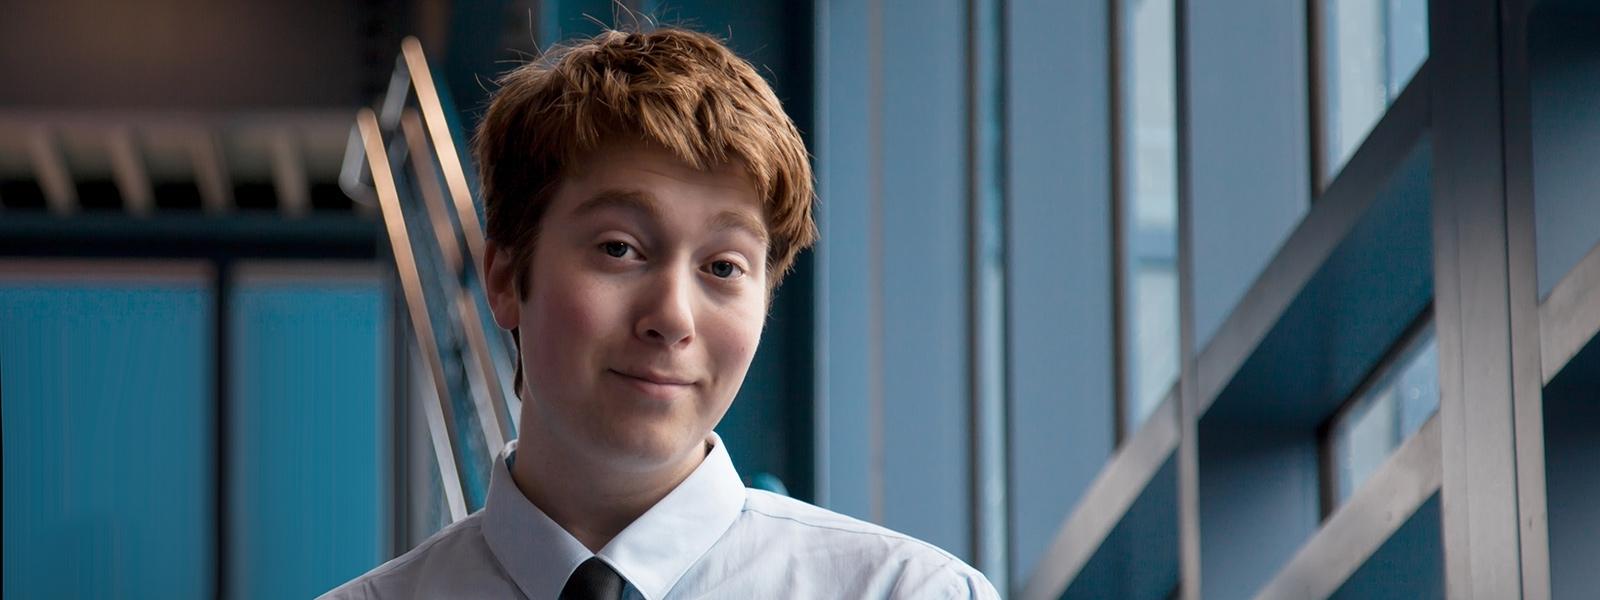 Julian Mosher: A Scholarship, A New Future | Uw Tacoma